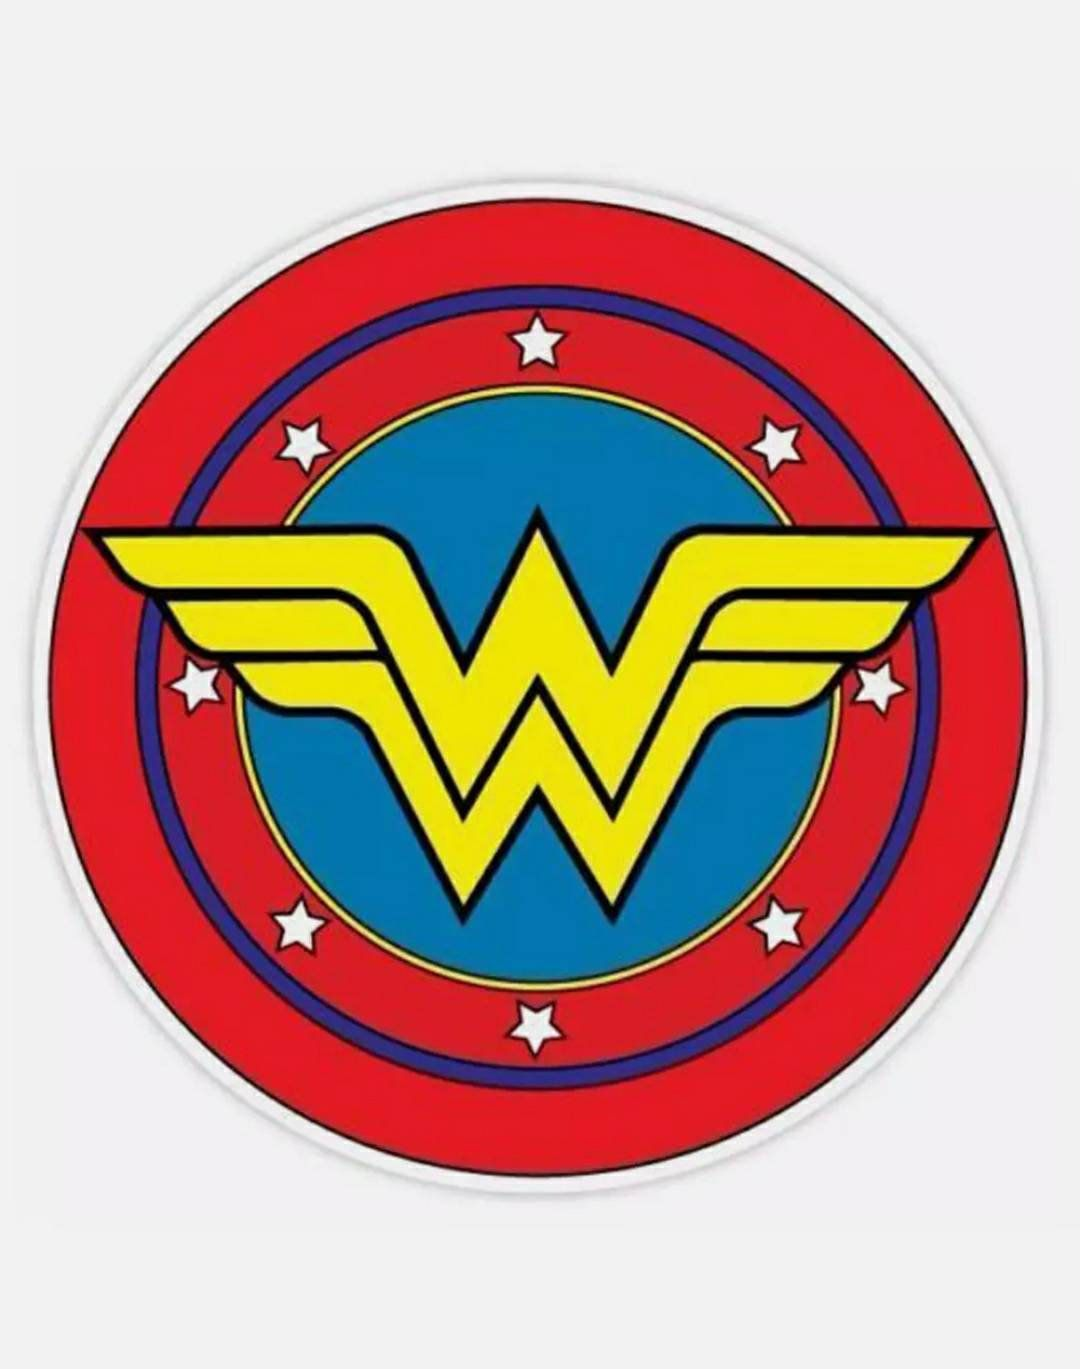 Wonder Woman Symbol Sticker Decal Etsy Female Symbol Wonder Woman Bumper Stickers [ 1369 x 1080 Pixel ]